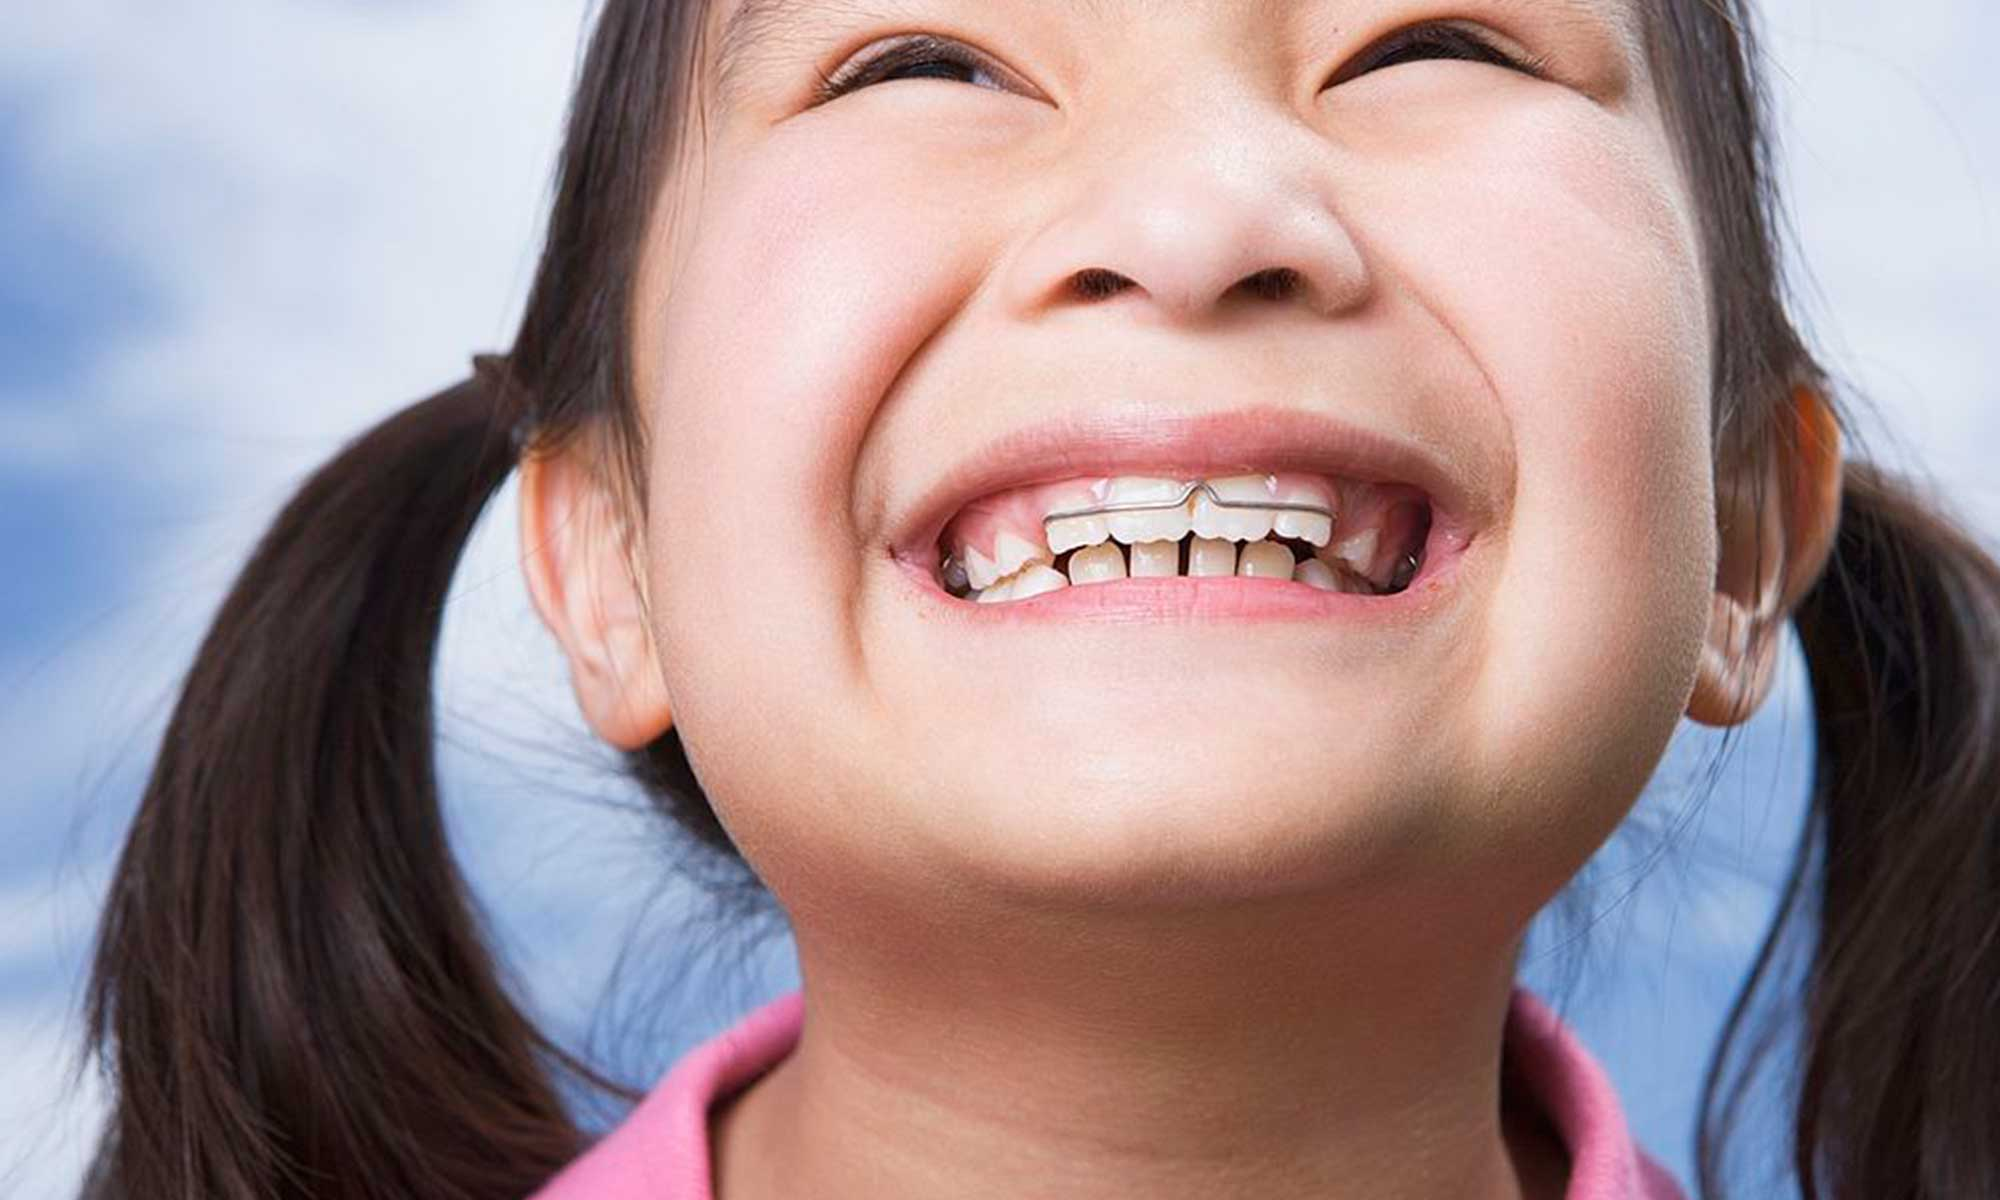 Thirroul Dental Studio Dentist North Wollongong Dentist 0403